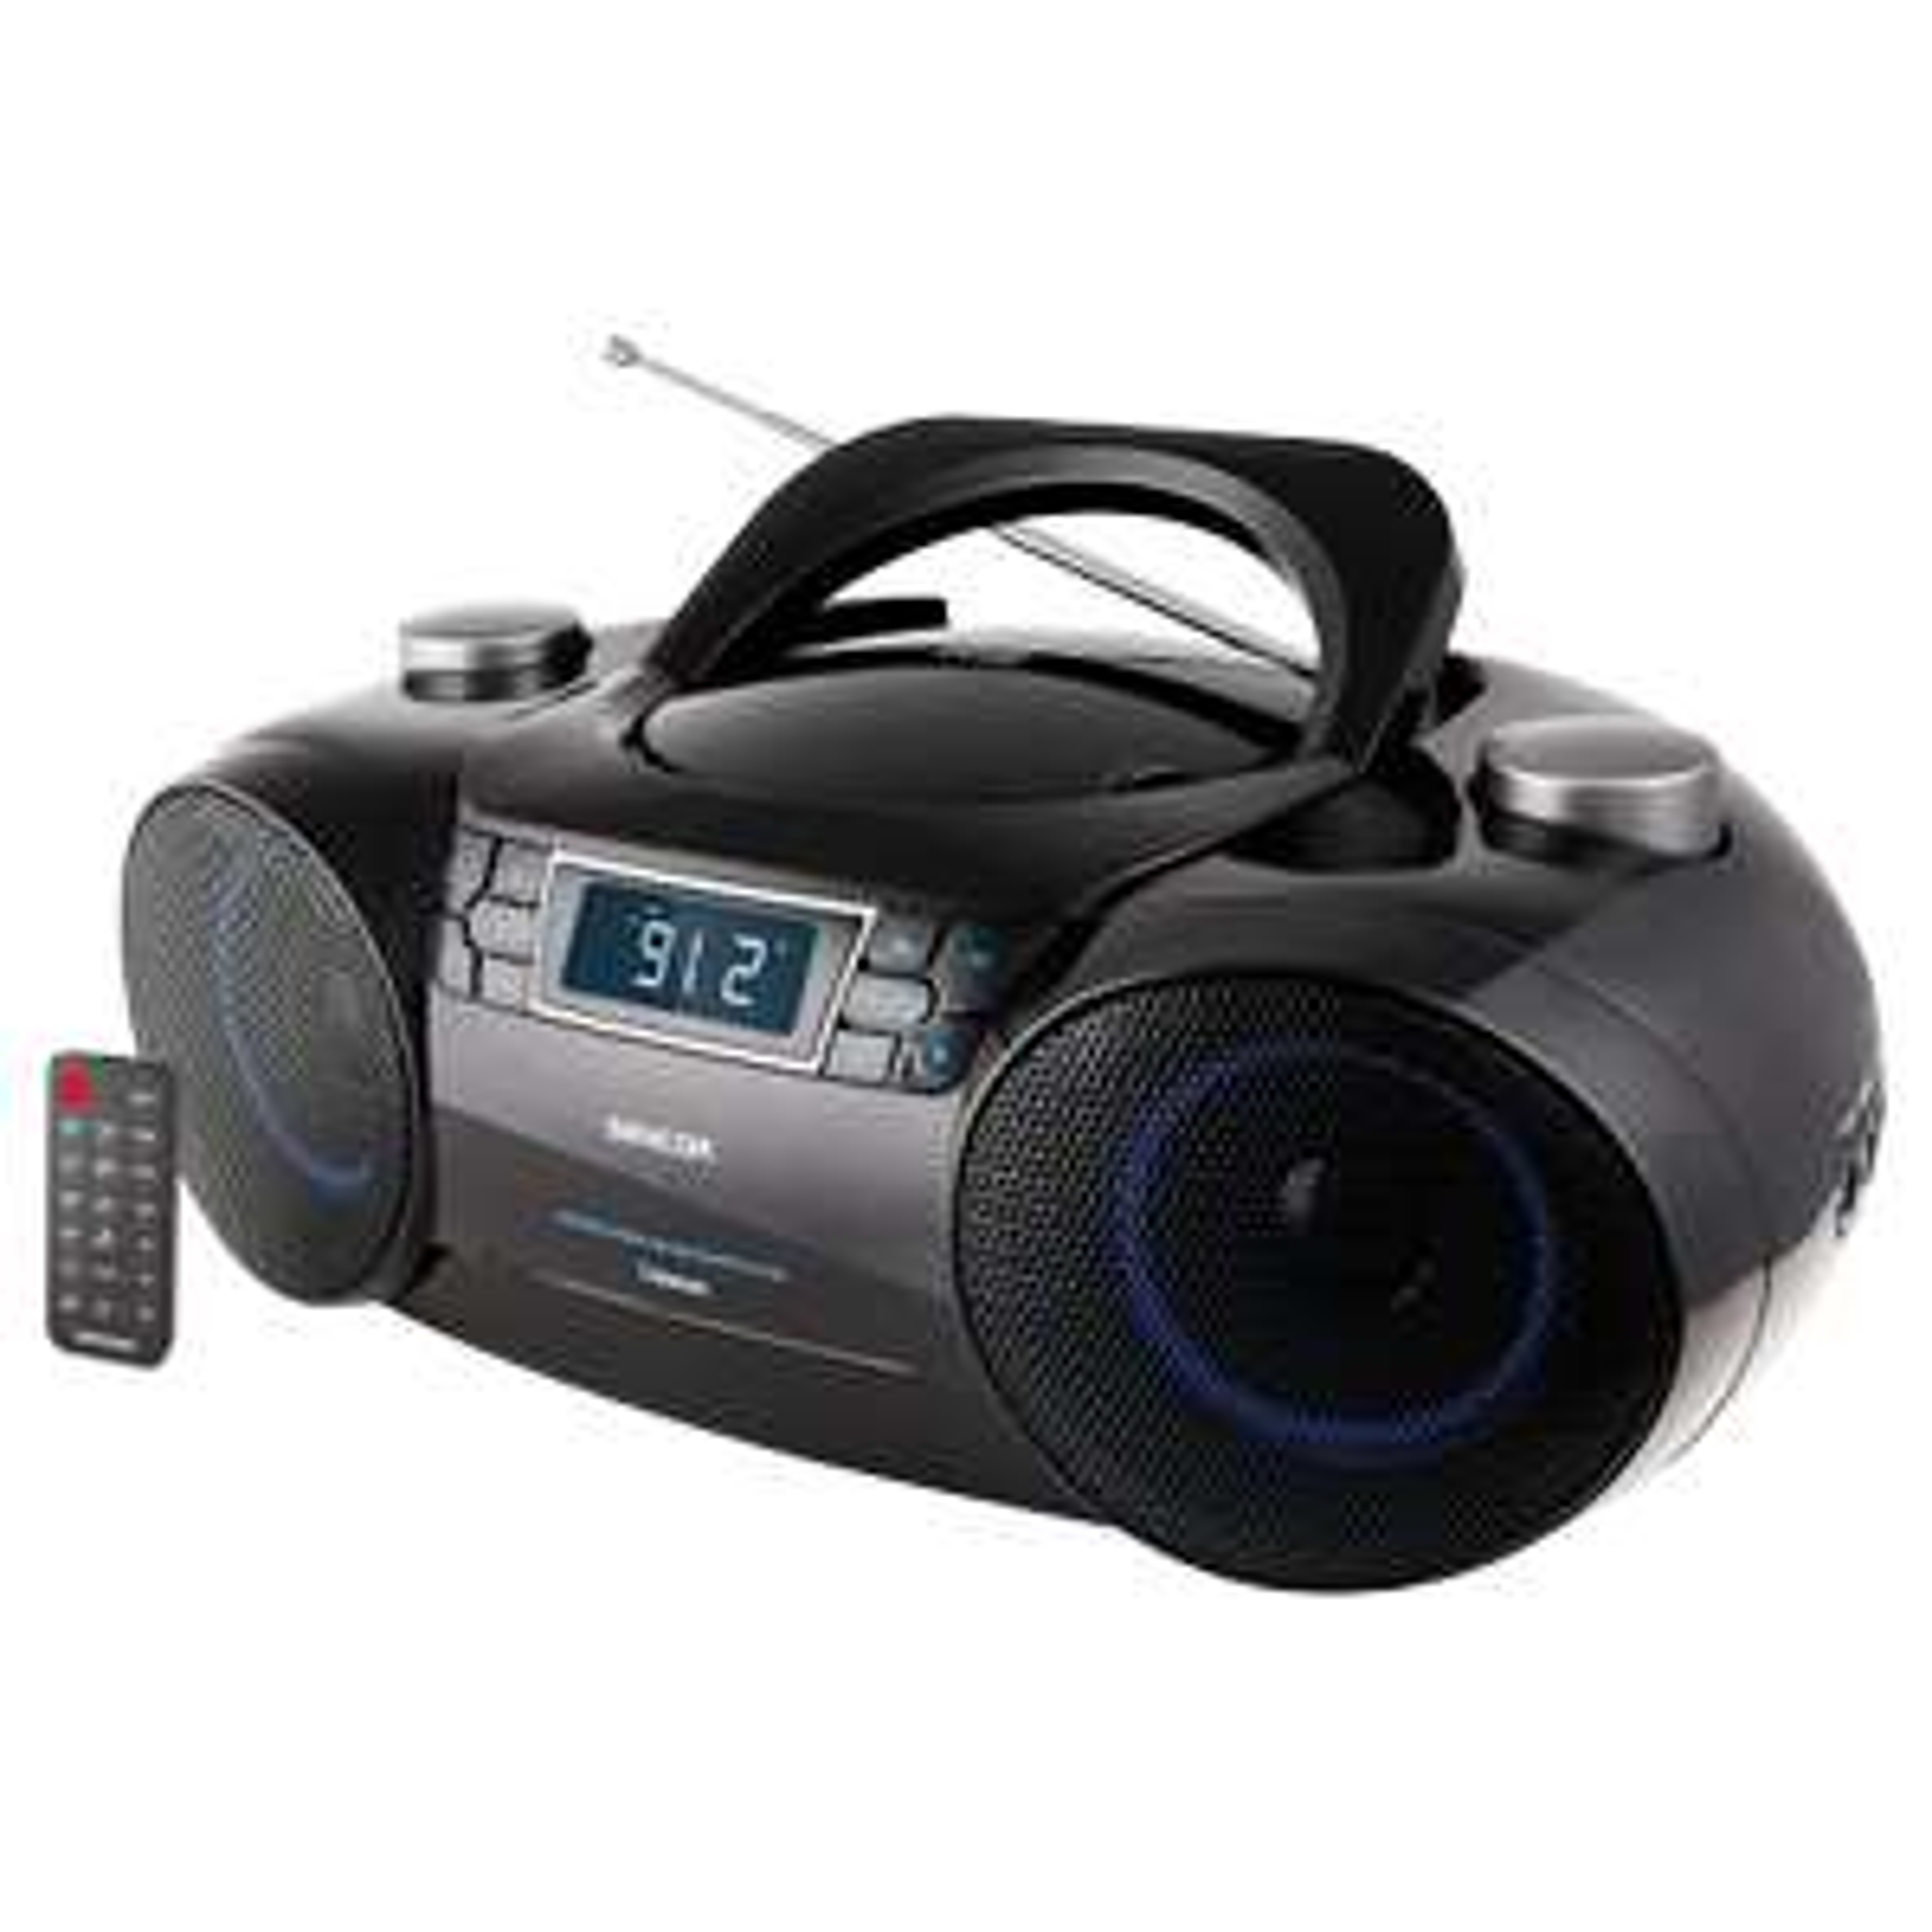 Sencor Spt 4700 Radio Fm Z Cd Bt Mp3 Sd Usb Aux 12w